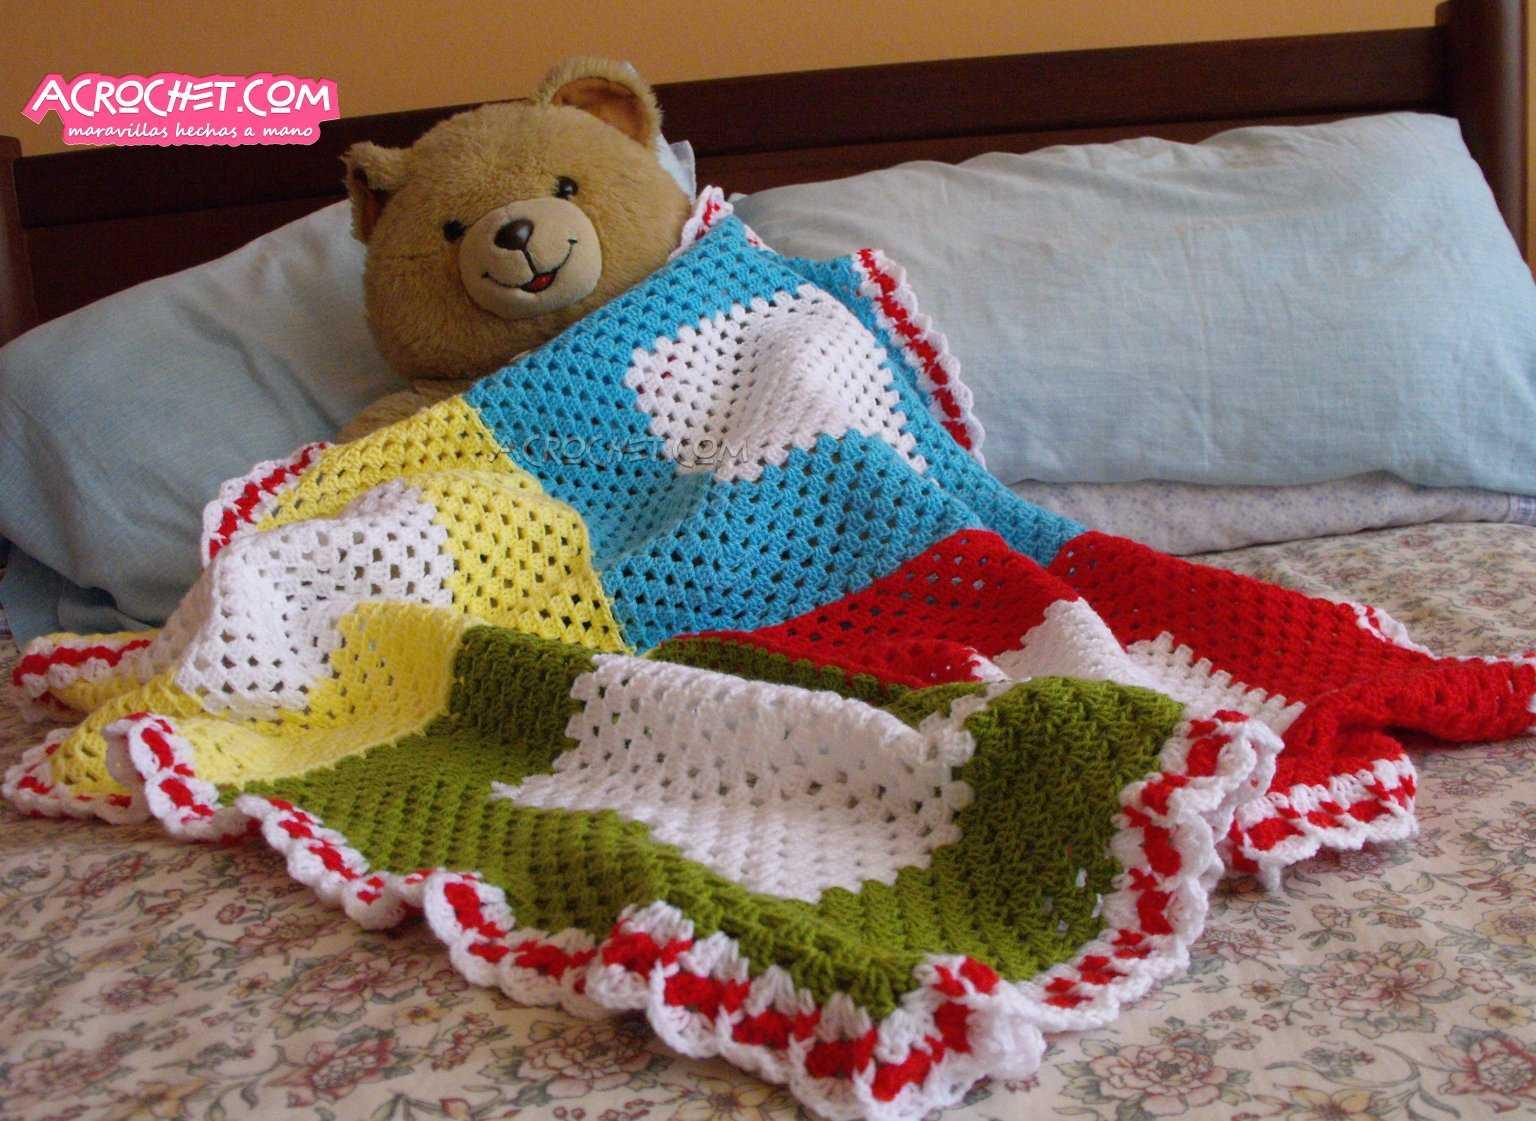 patrones gratis | Blog a Crochet - ACrochet